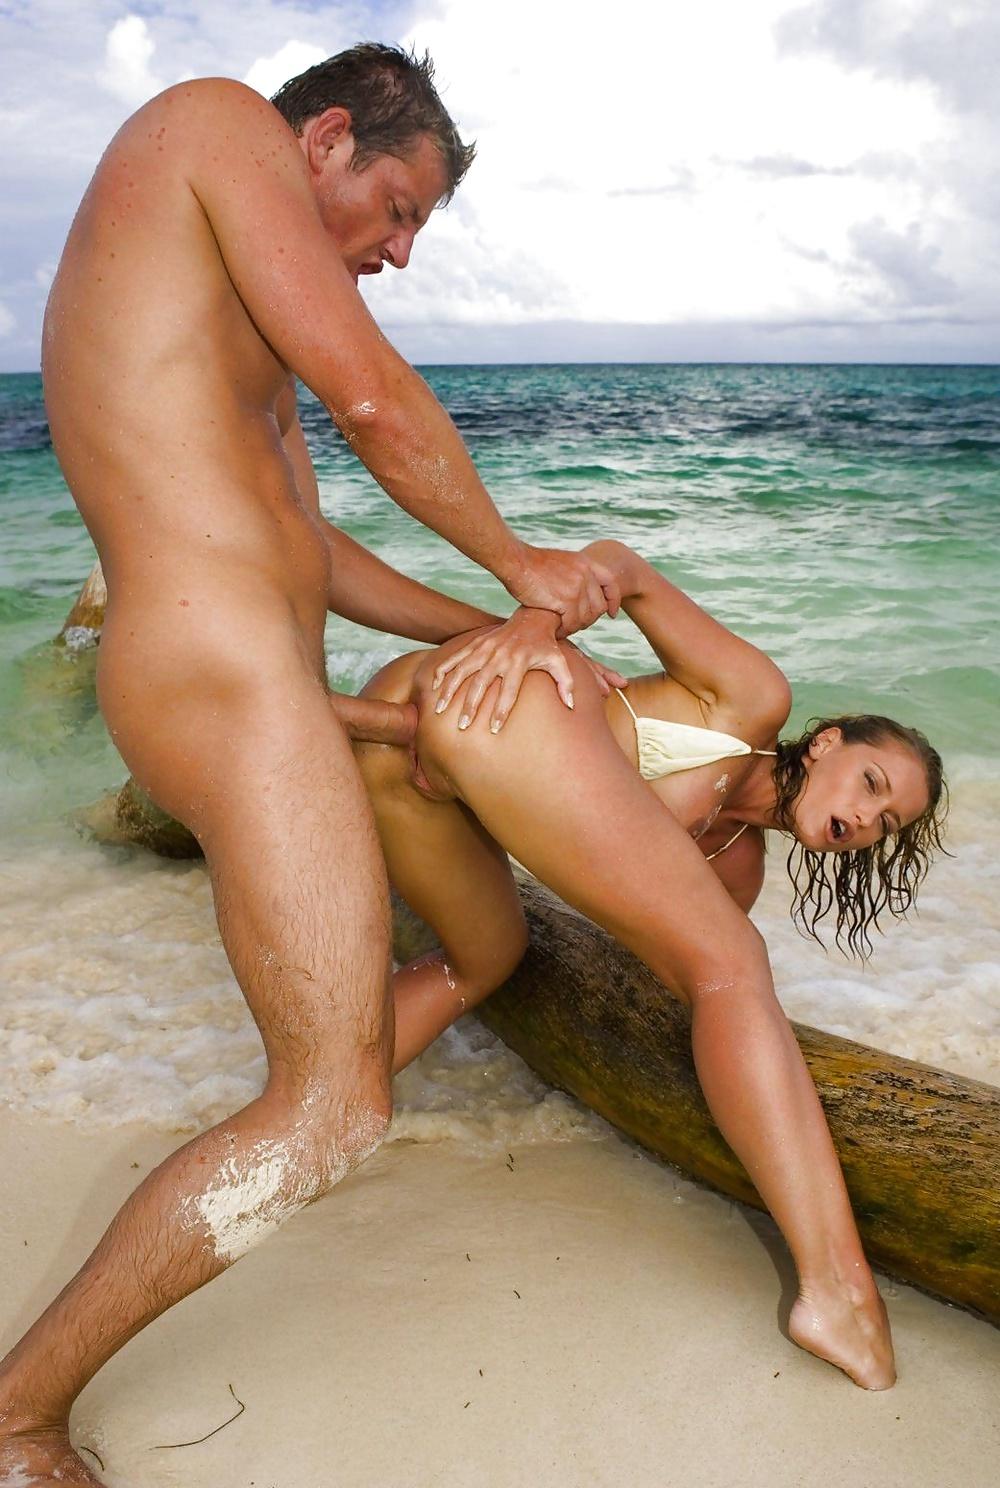 Sex the beach strangers